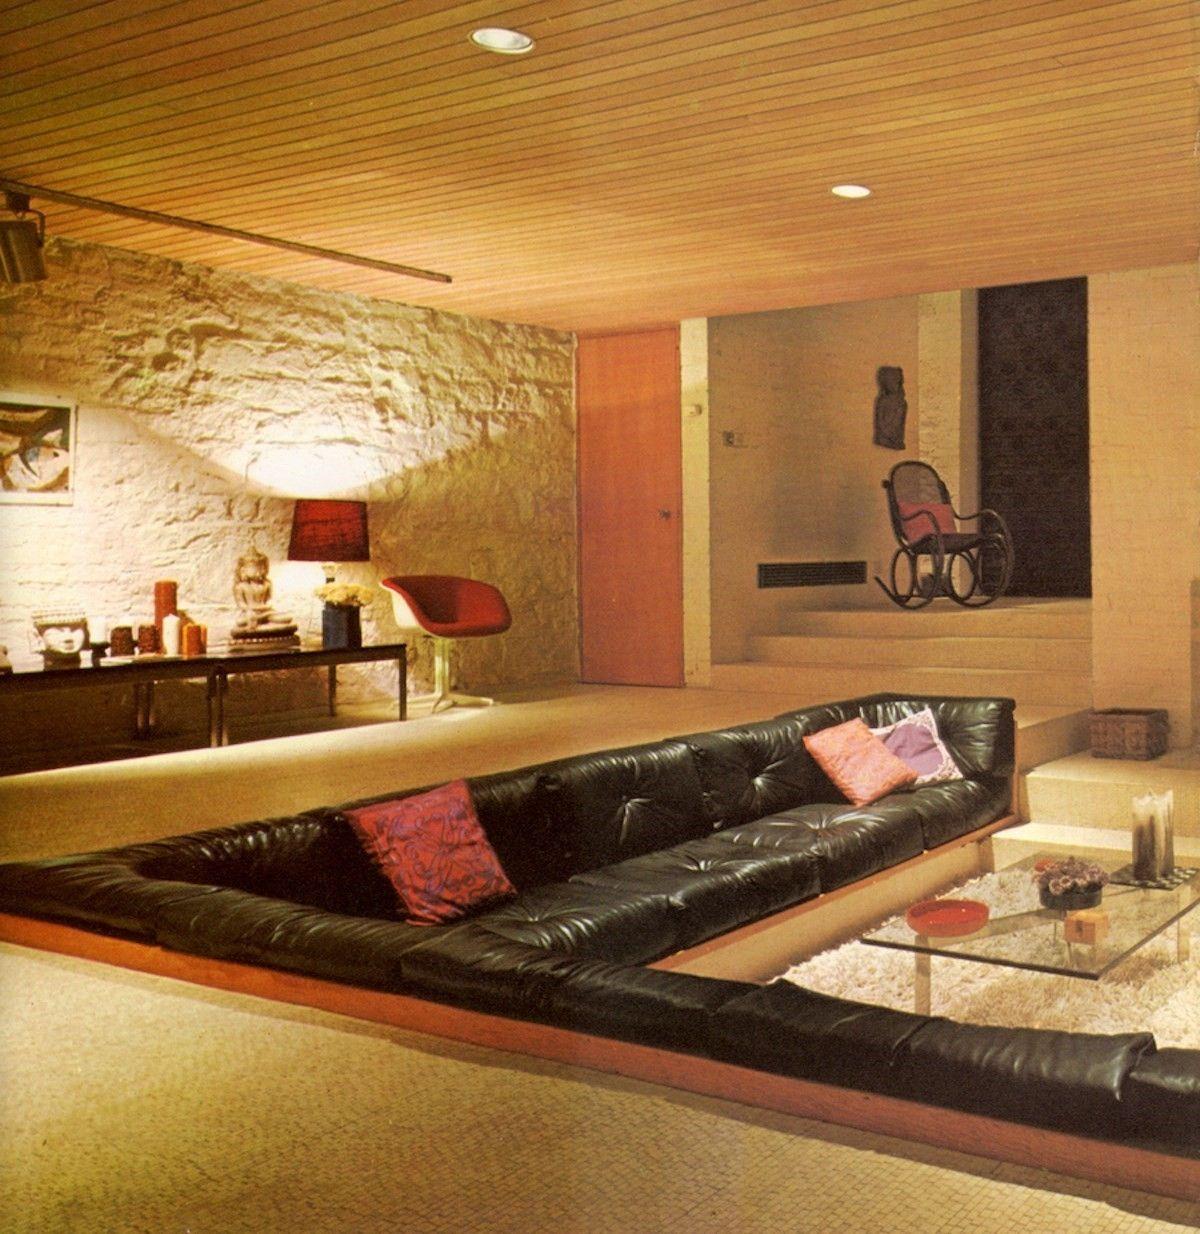 Retro Slaapkamer Ideeen.Late 60s Ish Mcm Retro Style Living Room Vintage Interior